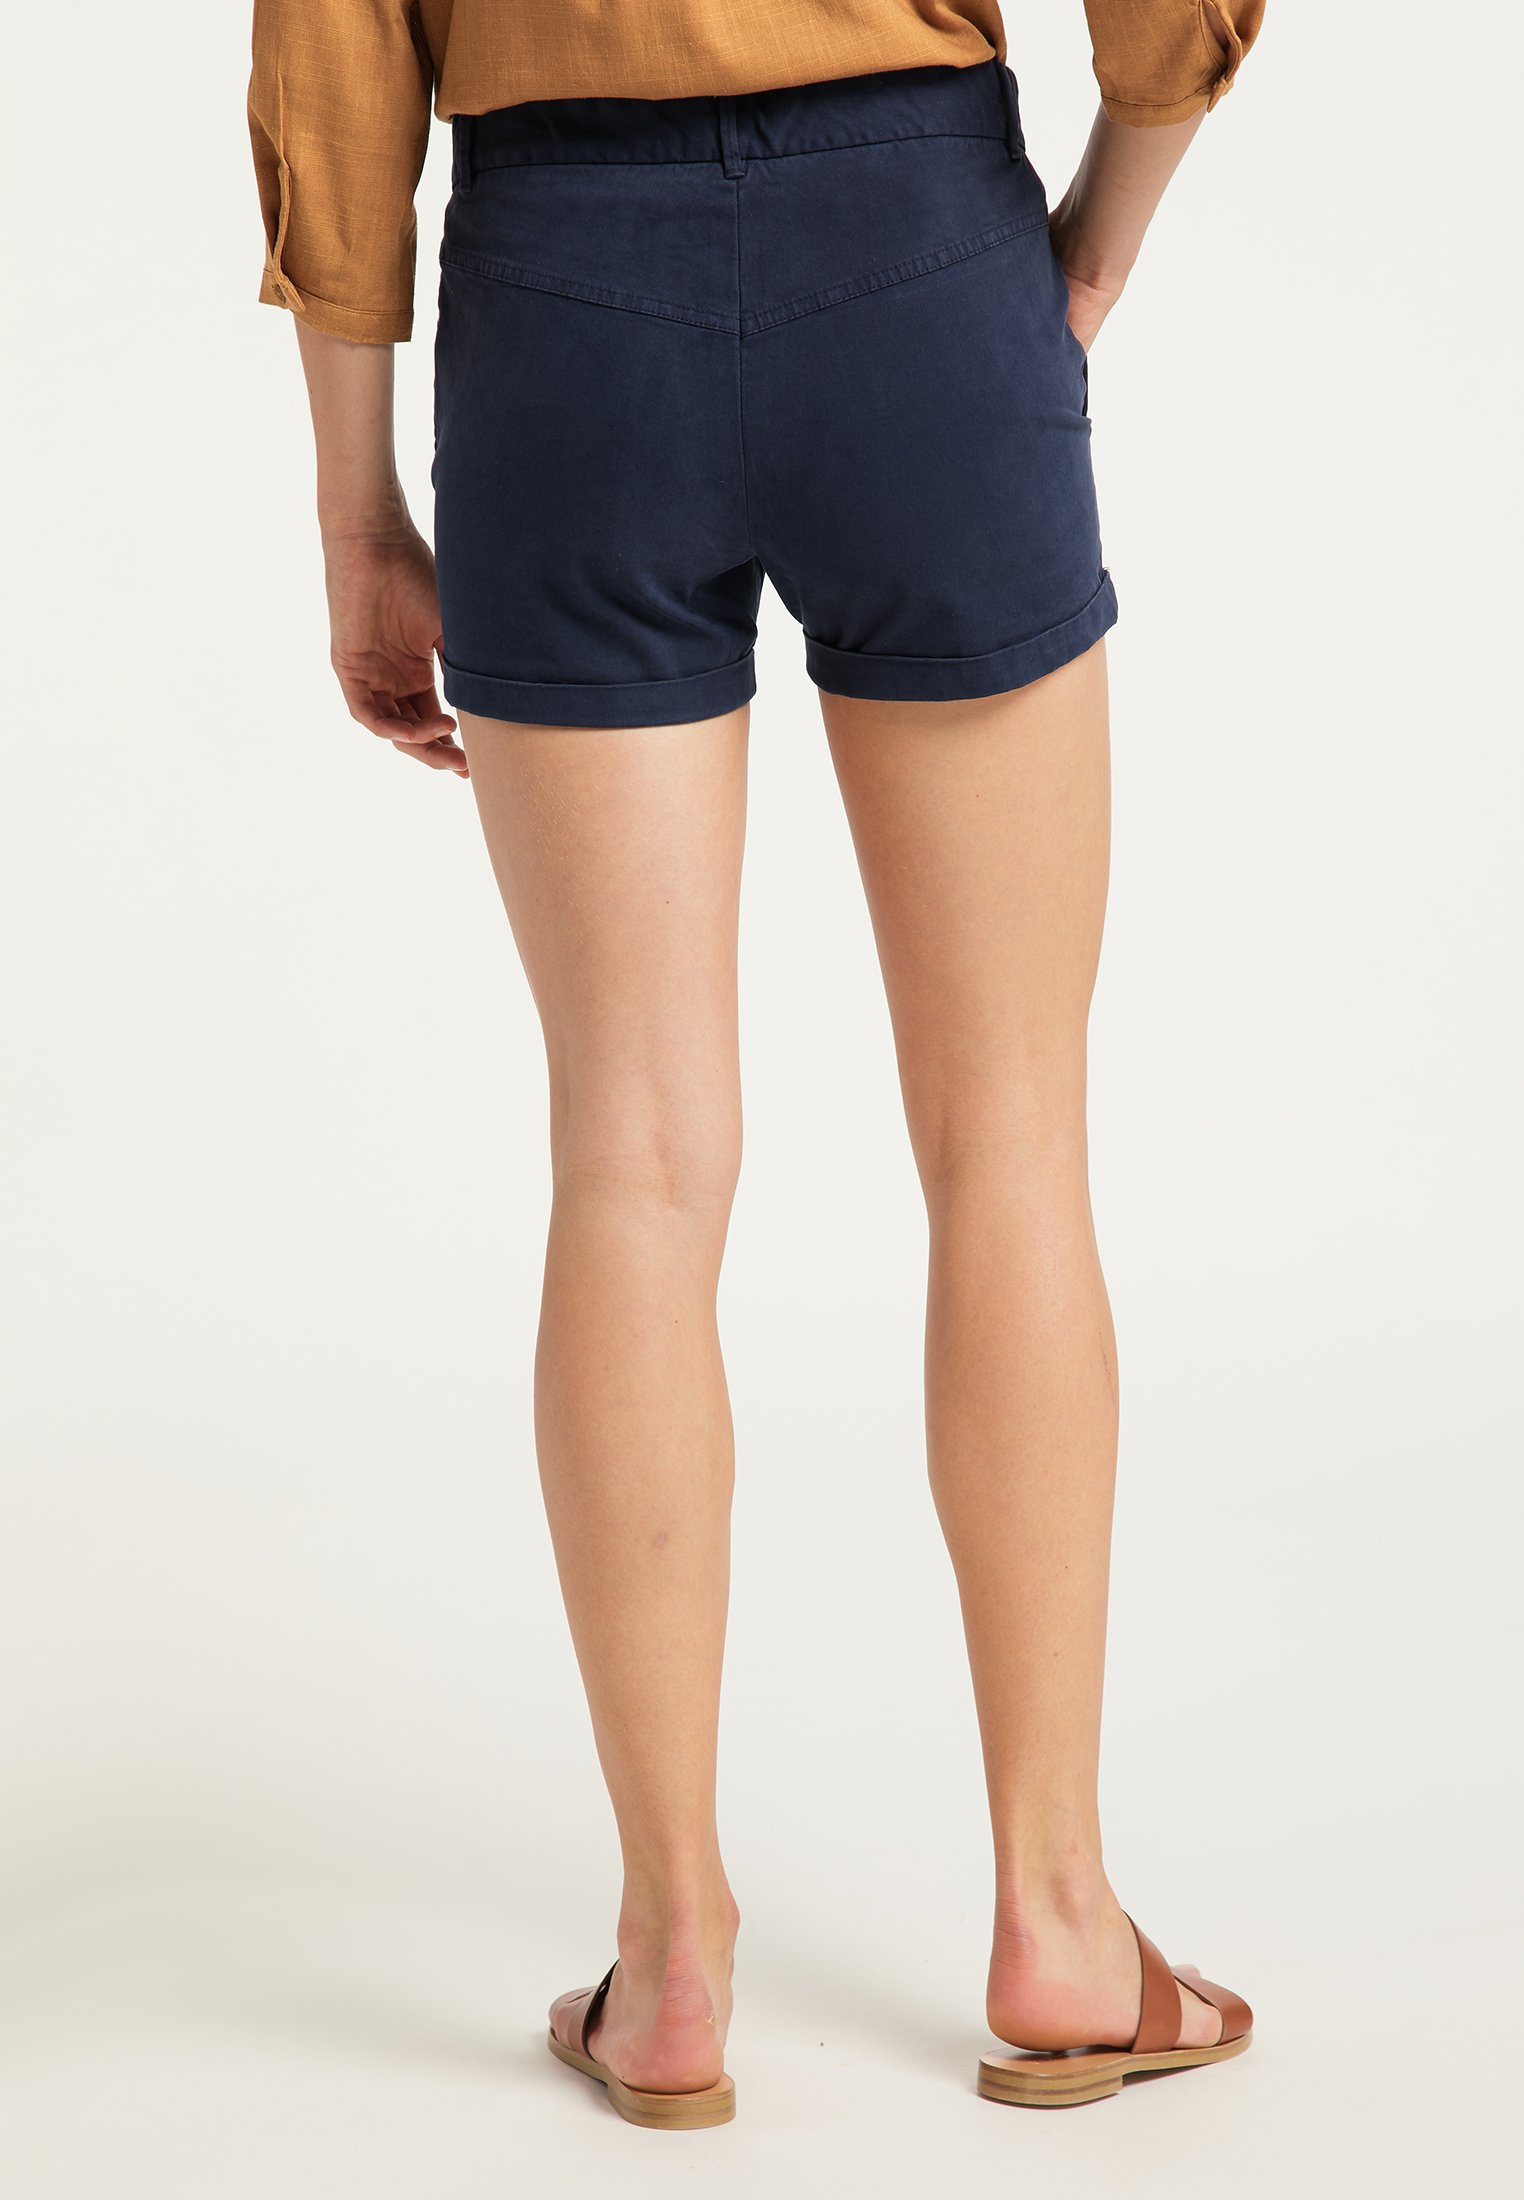 Perfect Women's Clothing DreiMaster Shorts marine 6aeqG172z